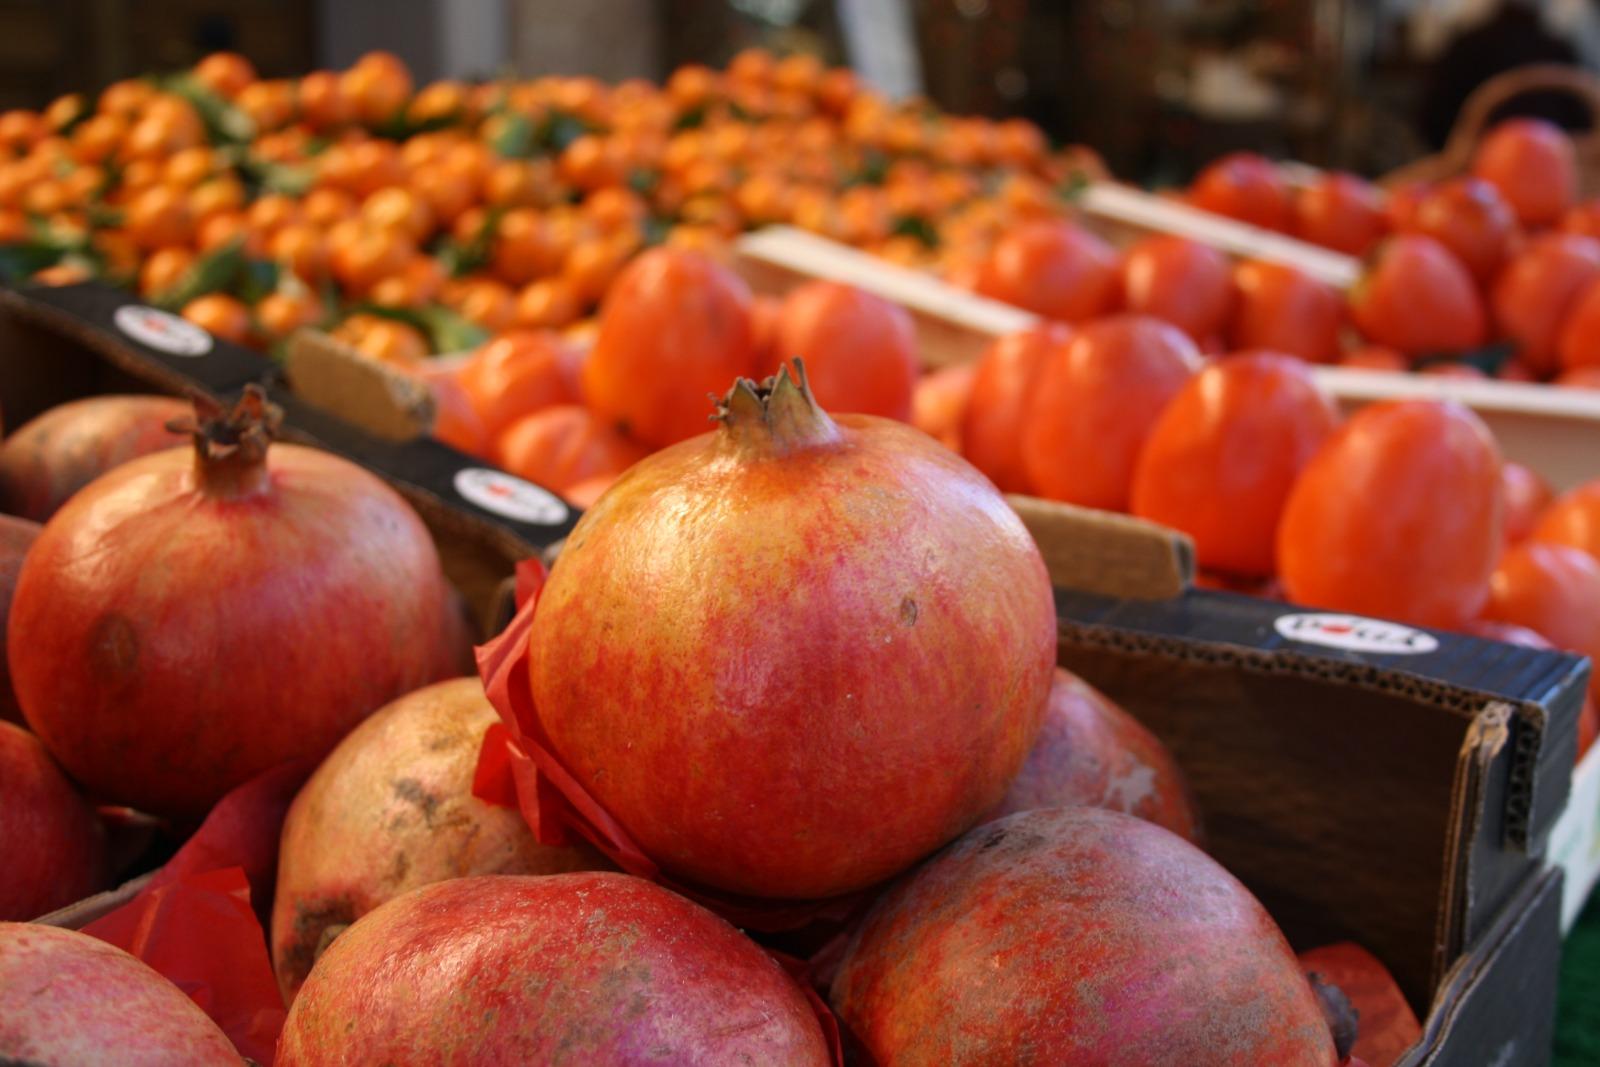 20 Healthy Foods to Eat Season by Season